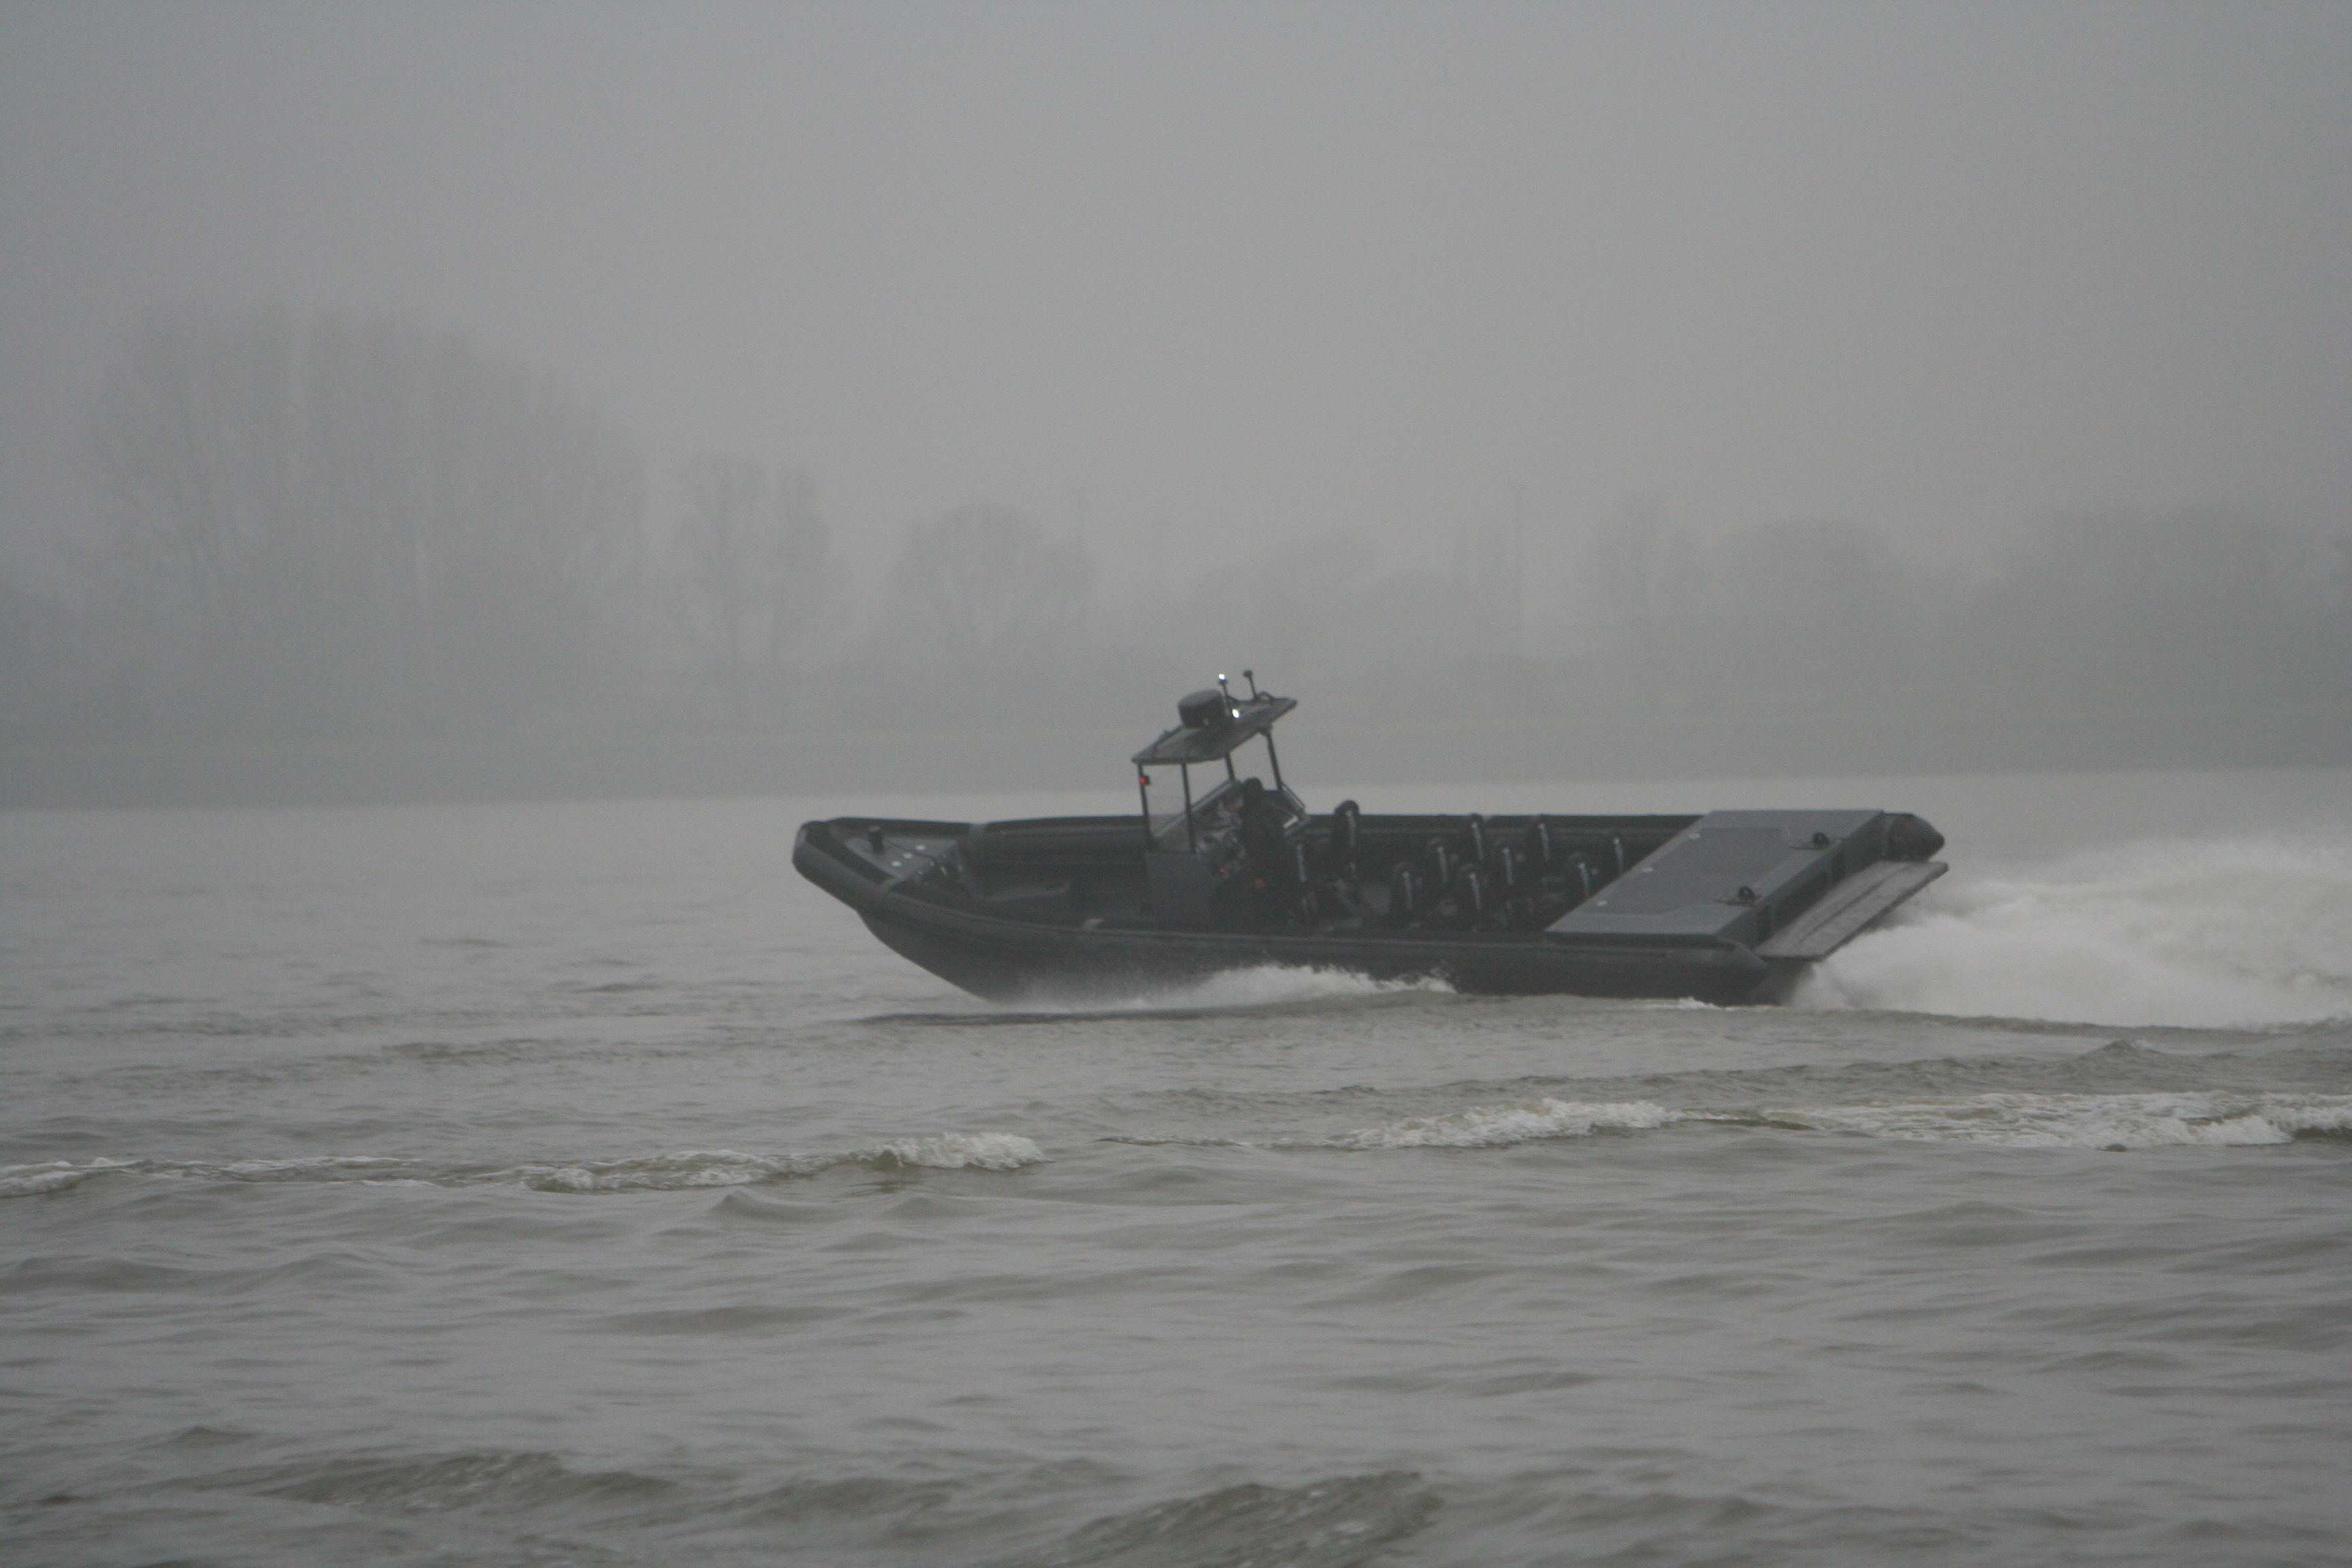 https://www.m-ribs.eu/wp-content/uploads/MRCD1250-Military-3-x-315HP-720x340.jpg